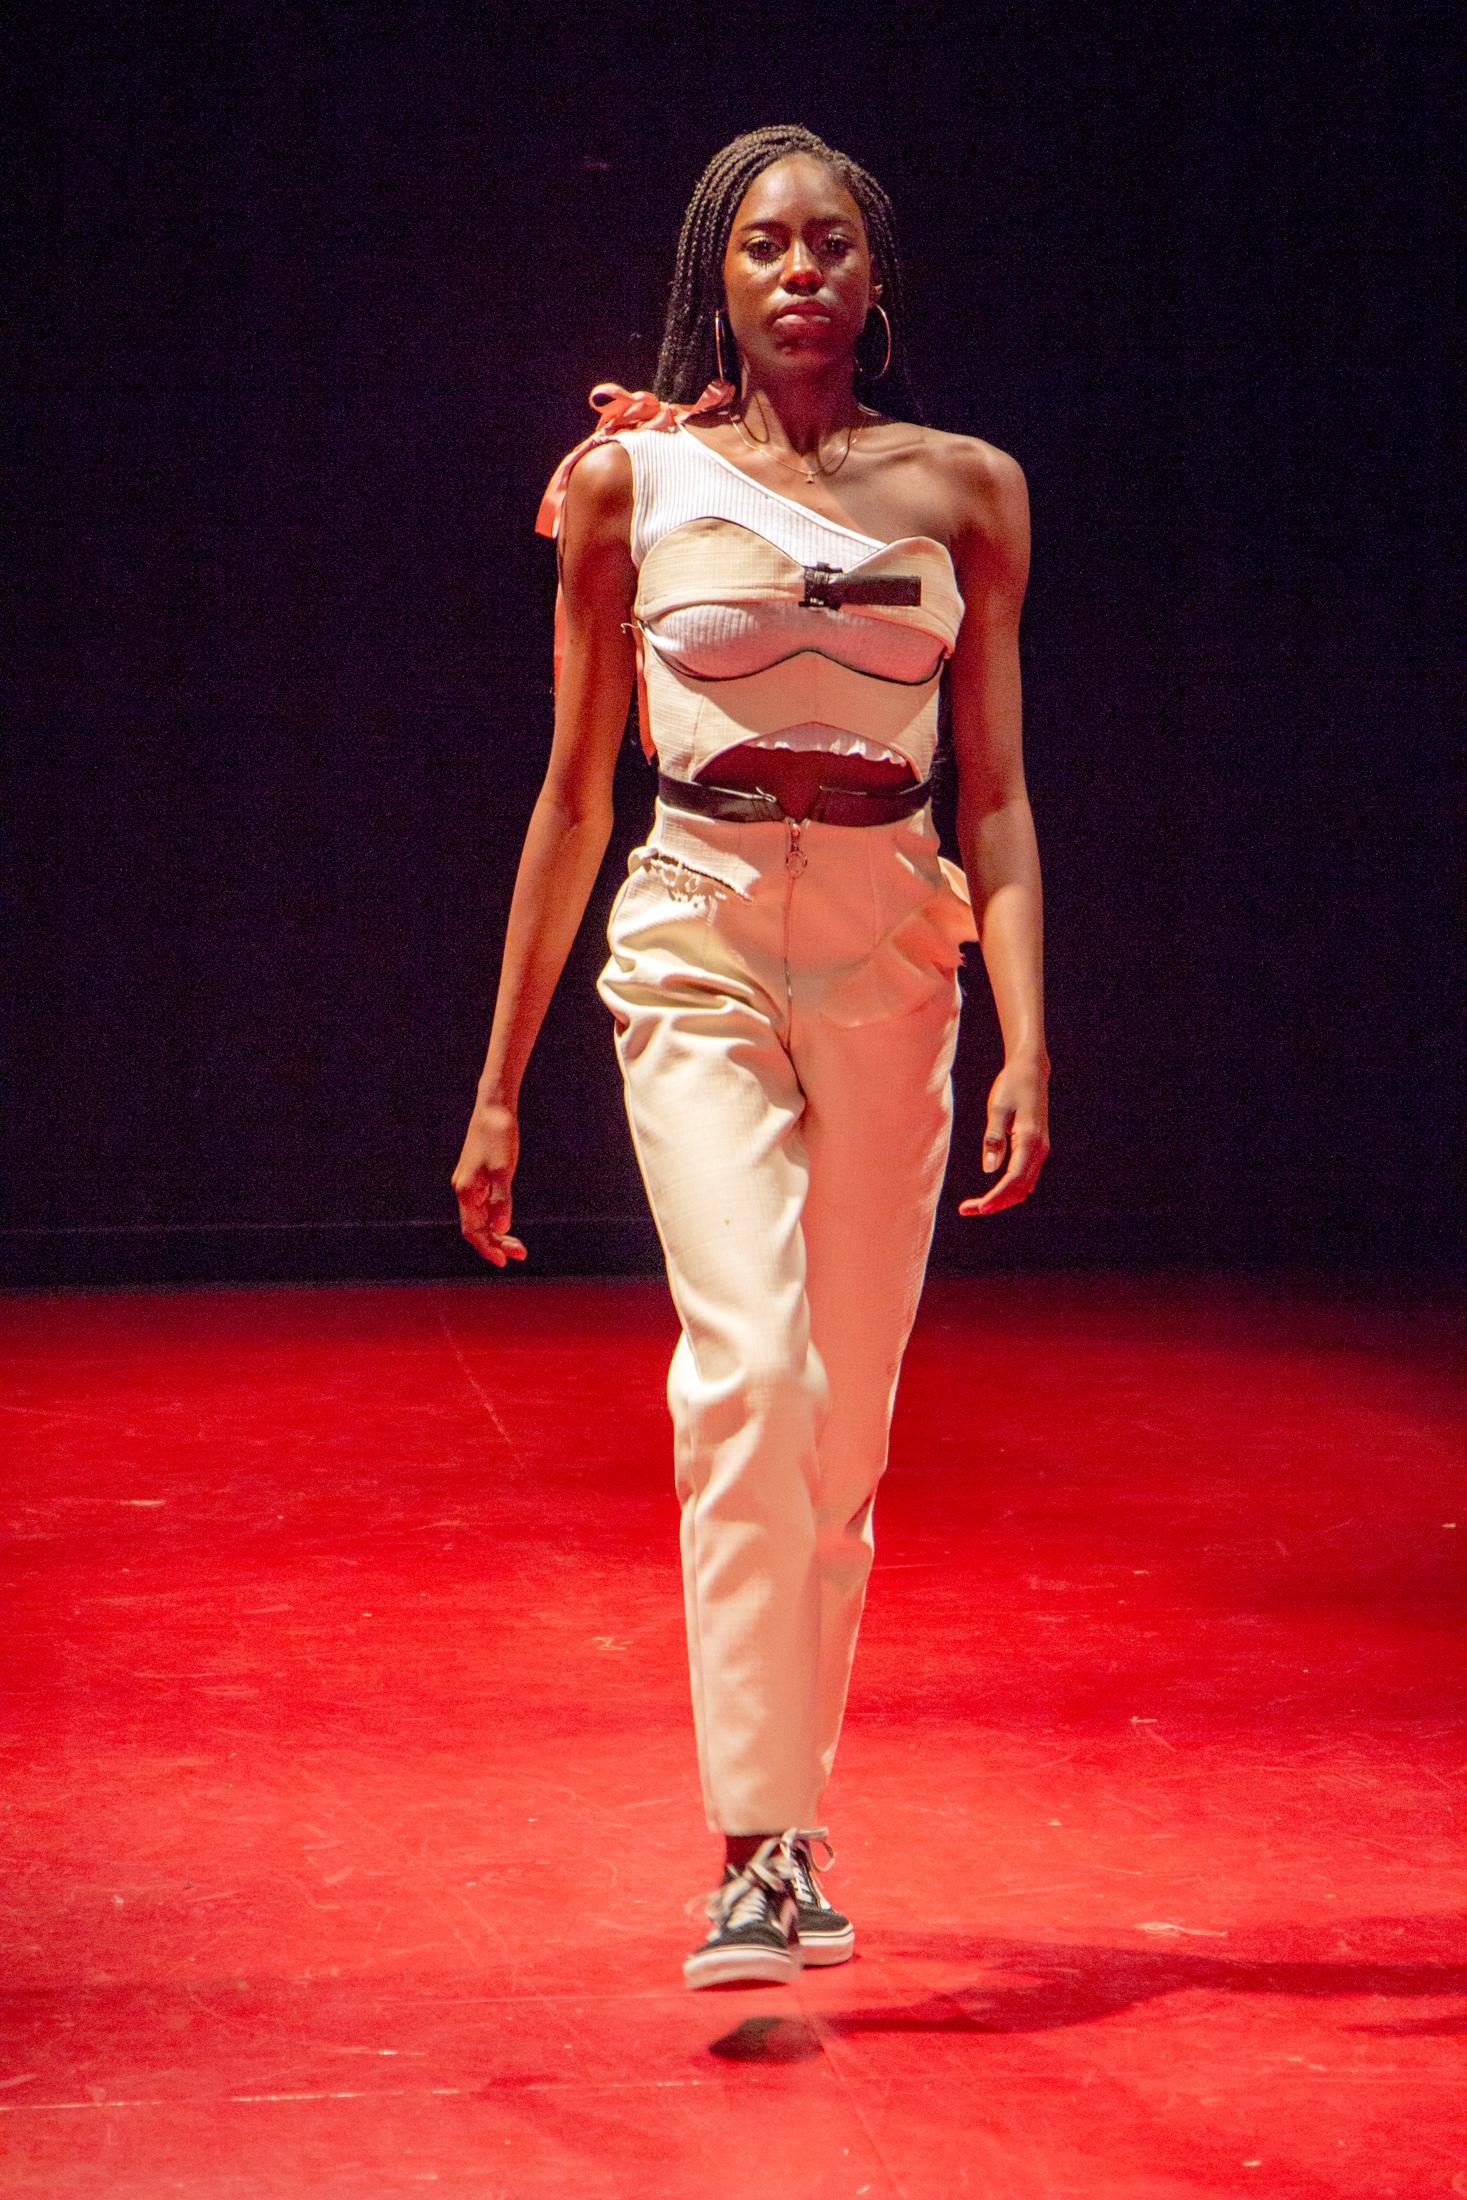 OSA-Fashion-Tehya Ruiz-PicGregGutbezahl-003.jpg